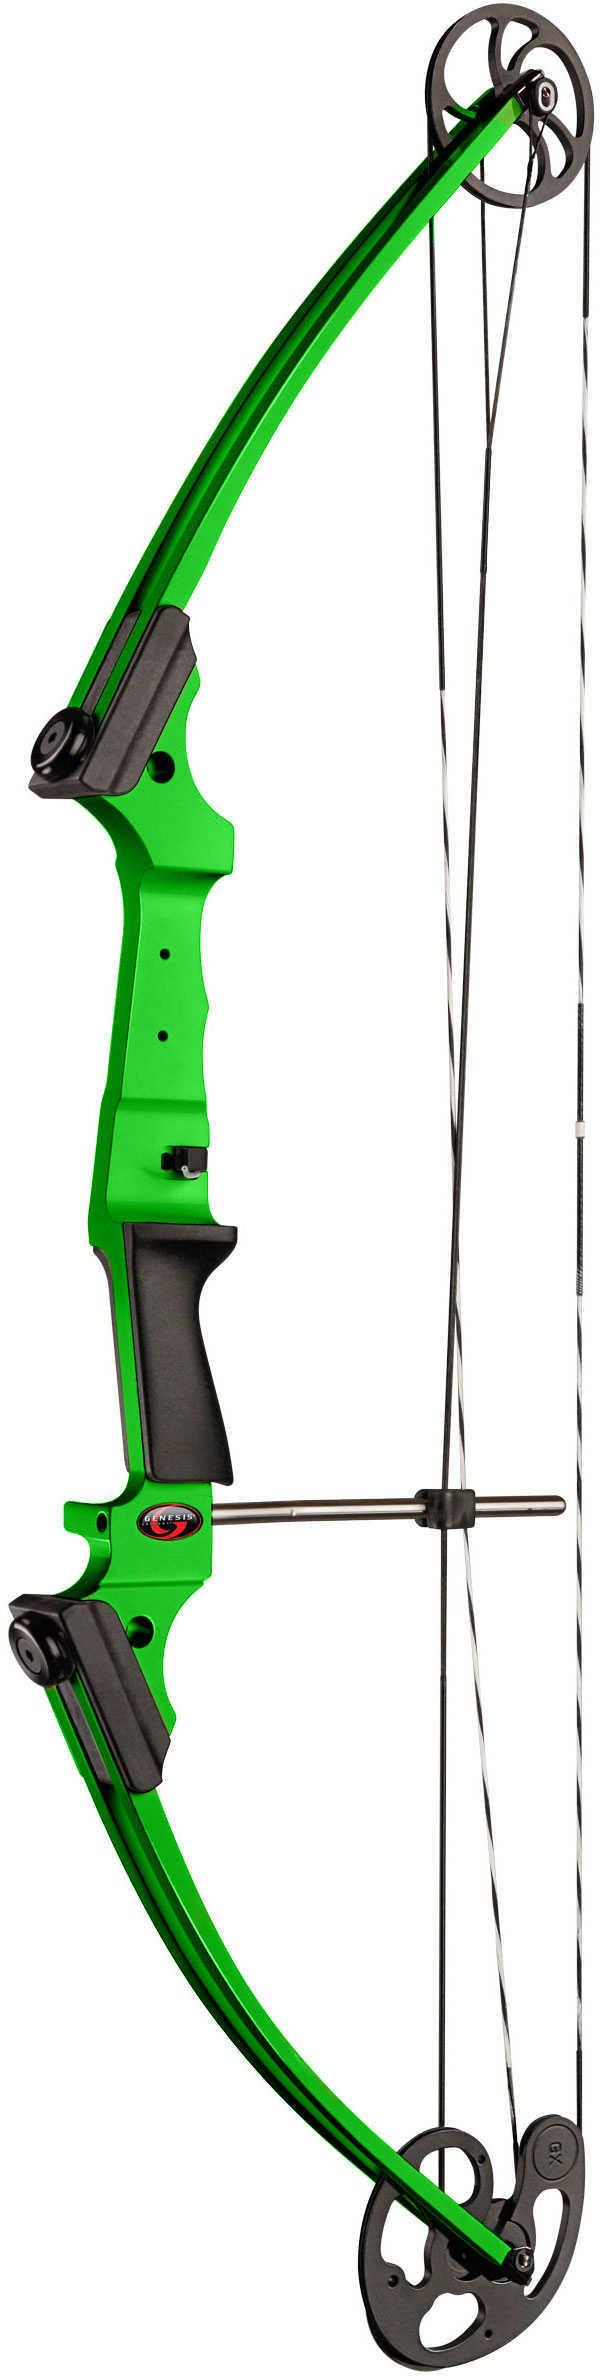 Genesis Bow Green RH Model: 10480